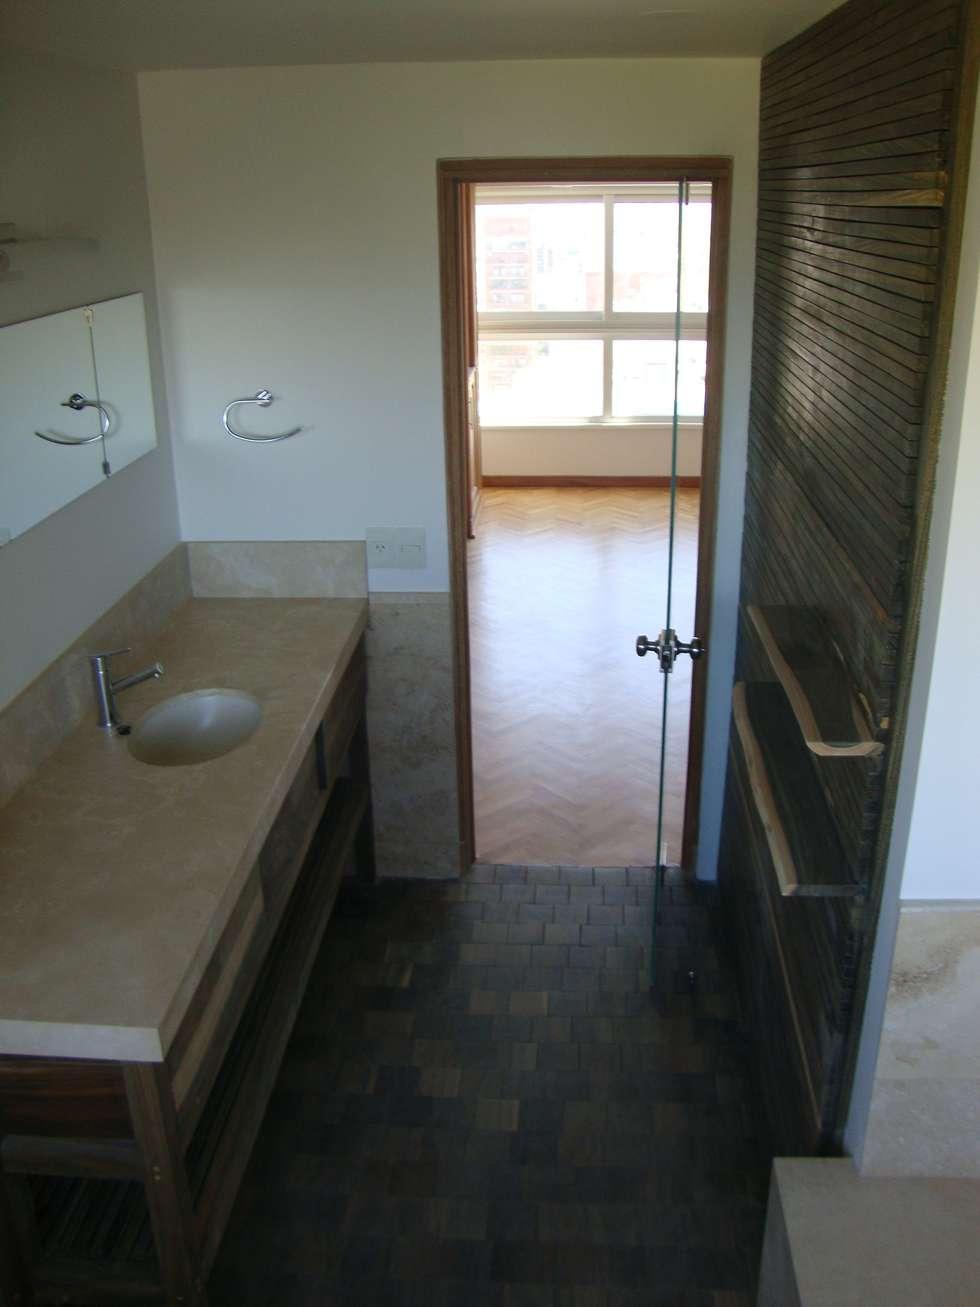 Baño en Madera Palo Santo marmol de Travertino: Baños de estilo moderno por Hargain Oneto Arquitectas